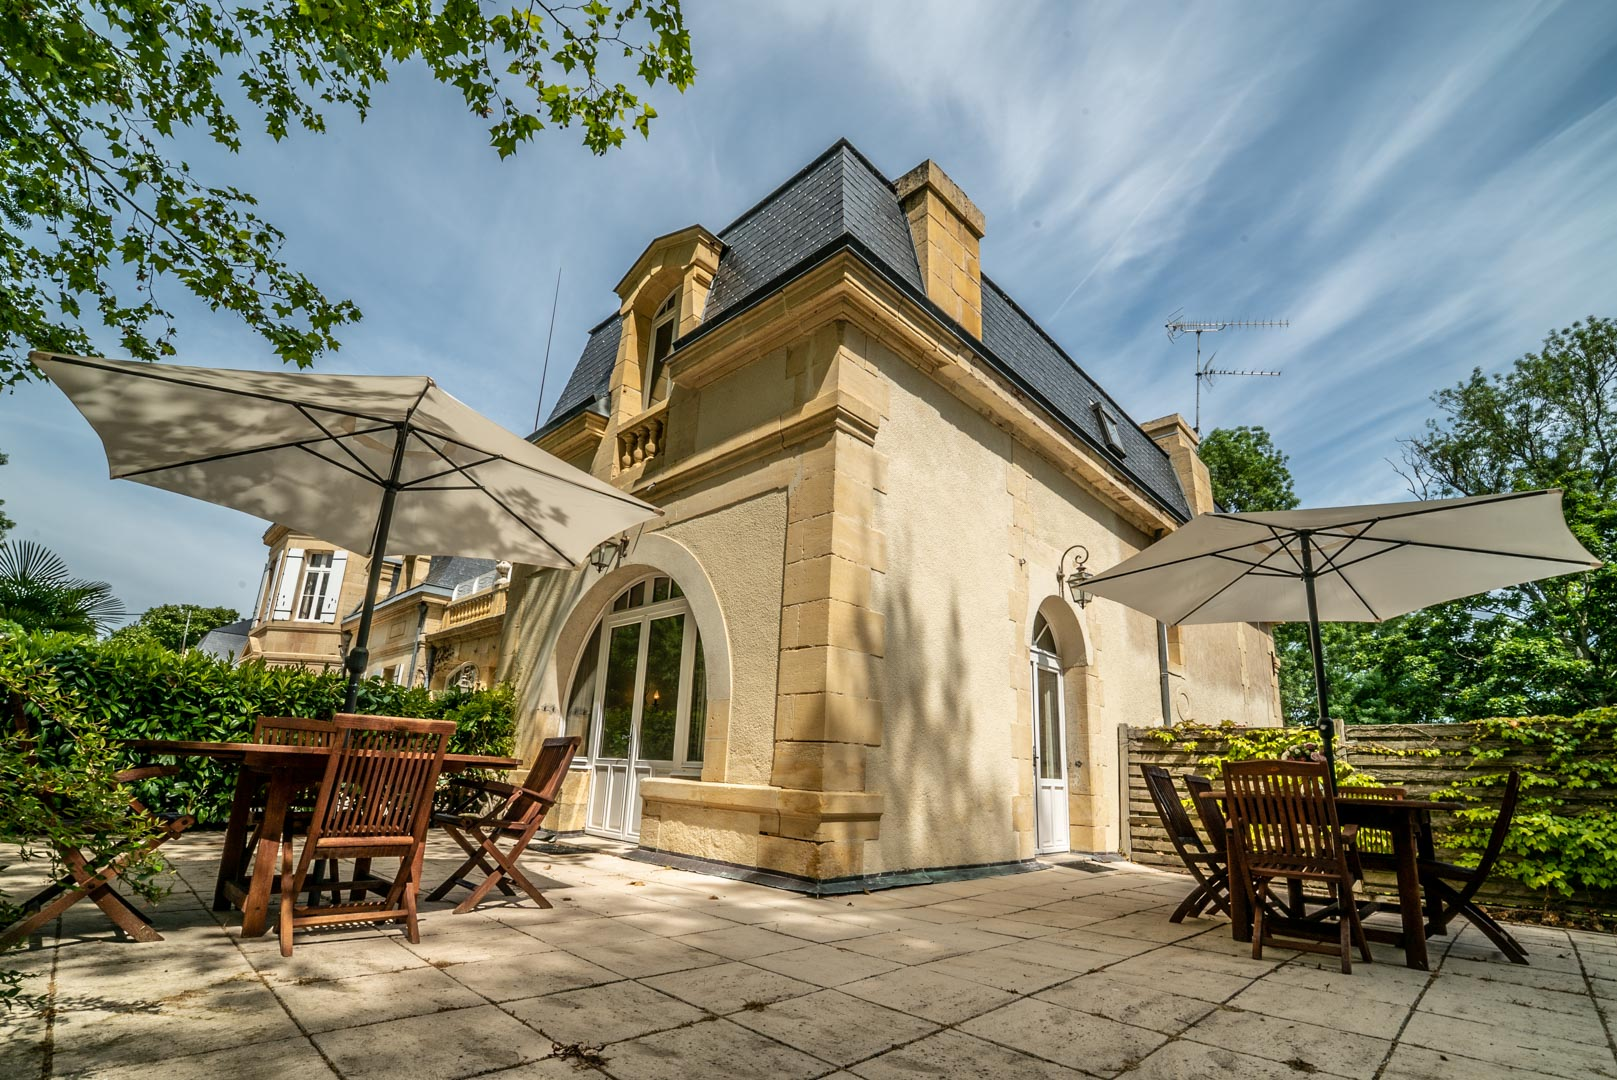 Suite Pécharmant Terrasse Chateau Rauly location bergerac Monbazillac